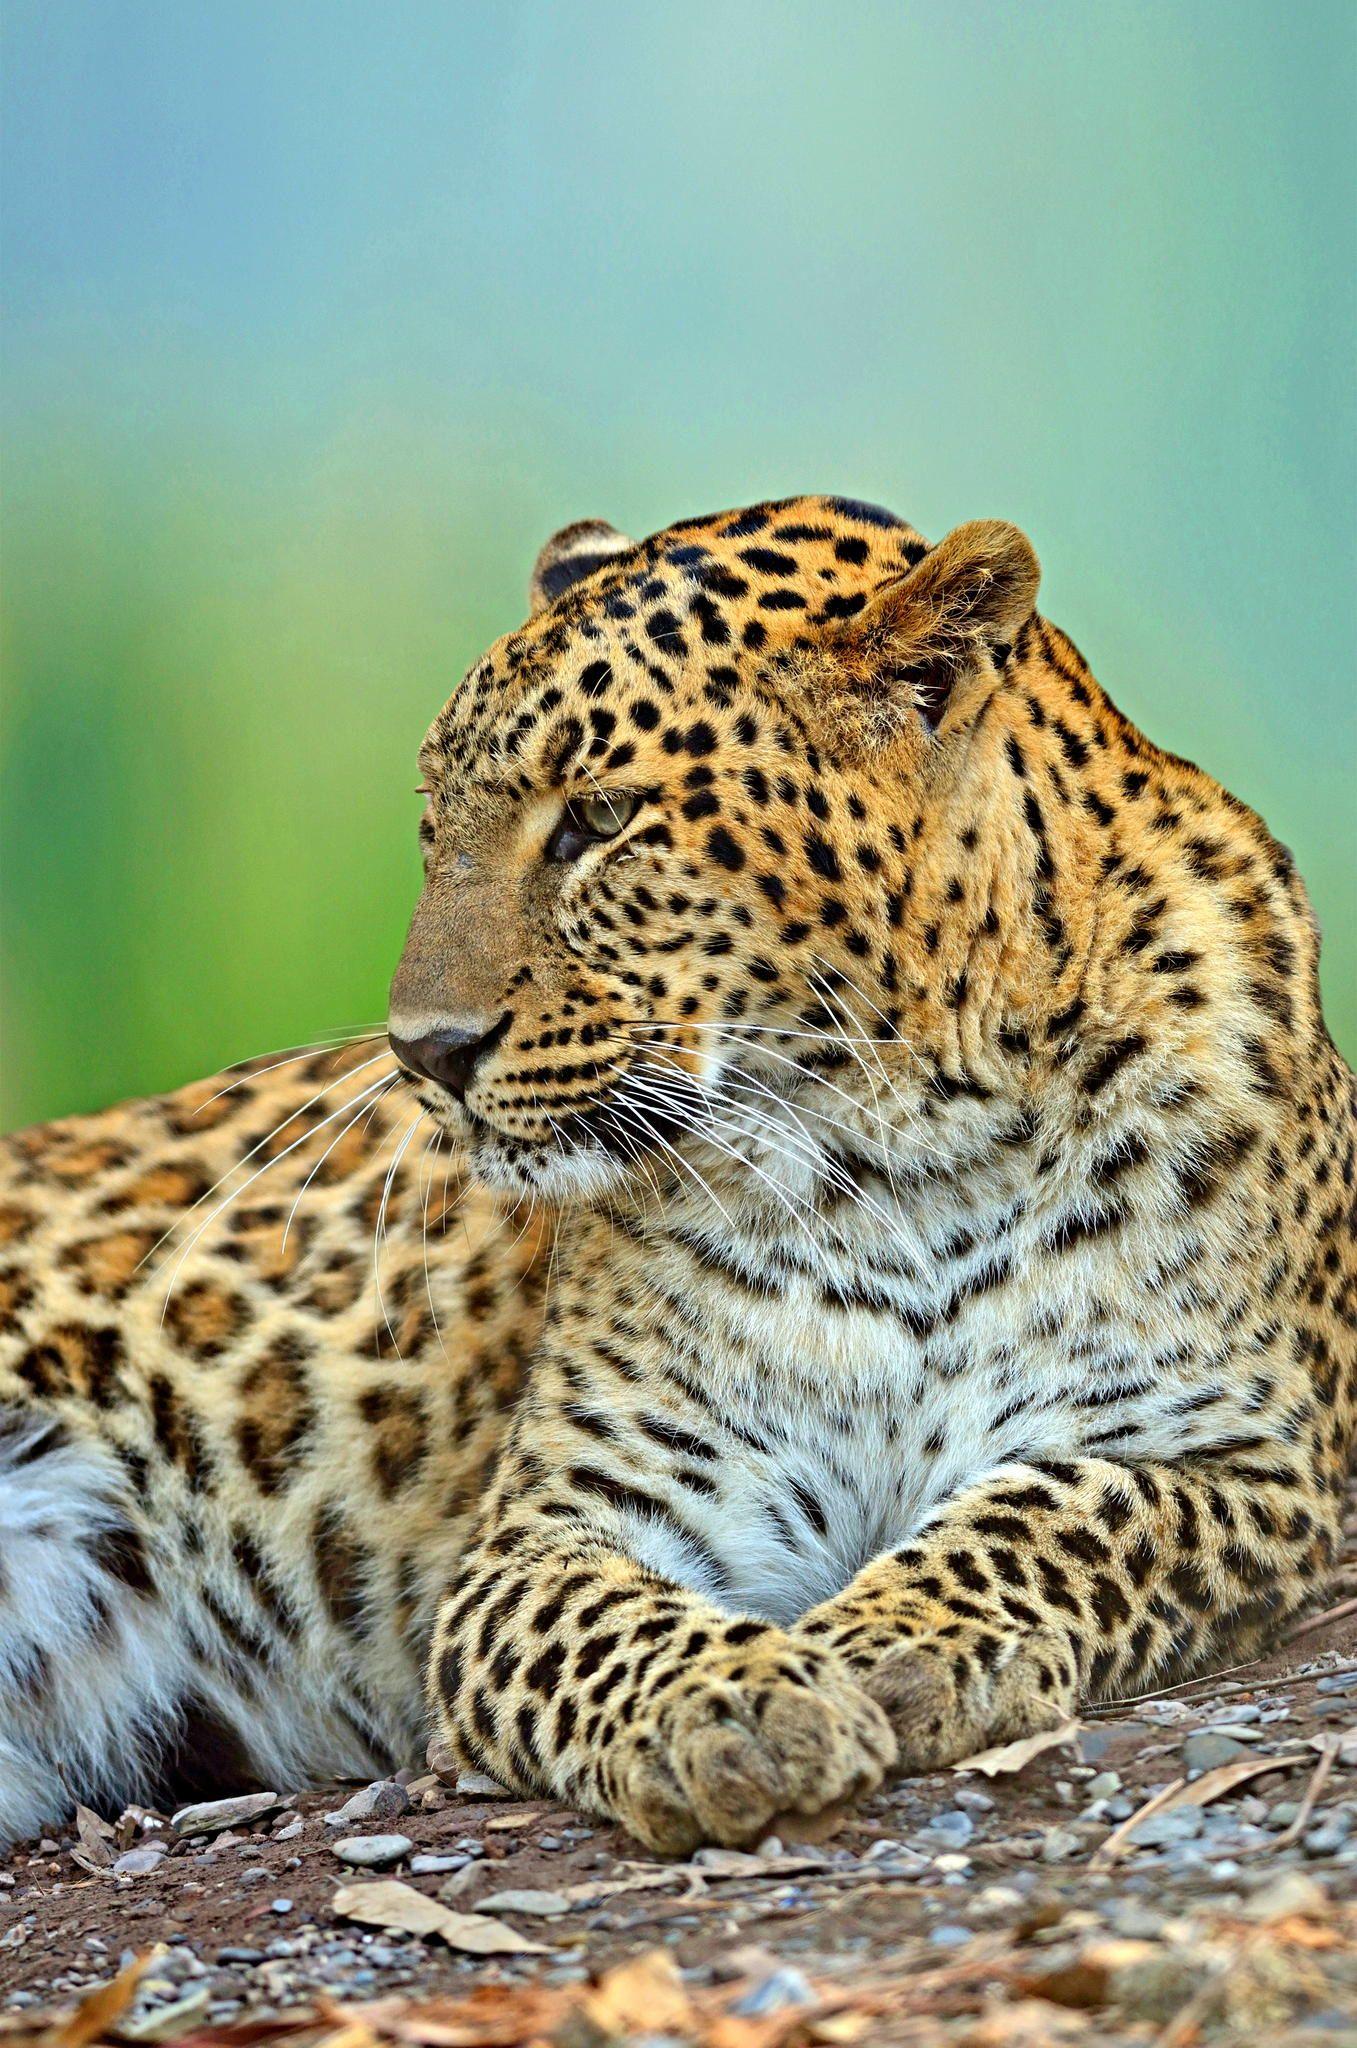 ~~Resting Beast | Leopard by Arun Bhardwaj~~